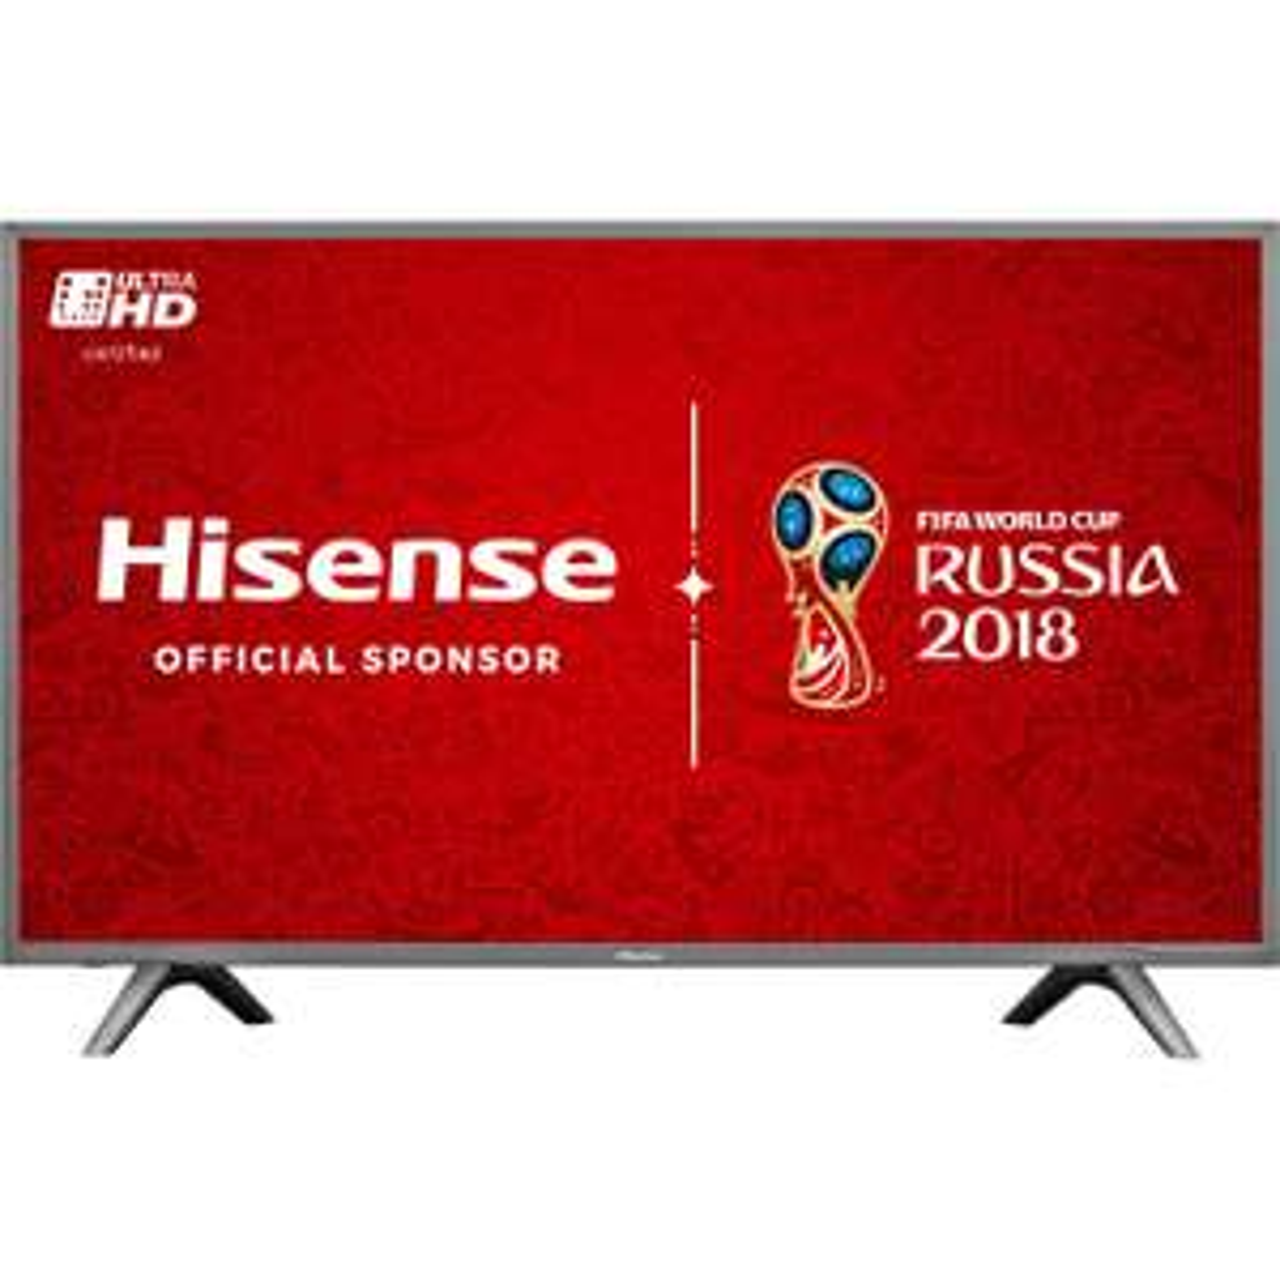 "Hisense H43N5700 43"" Smart 4K Ultra HD HDR TV + 2 yr Manufacturer Warranty £377.10 using code @ AO"